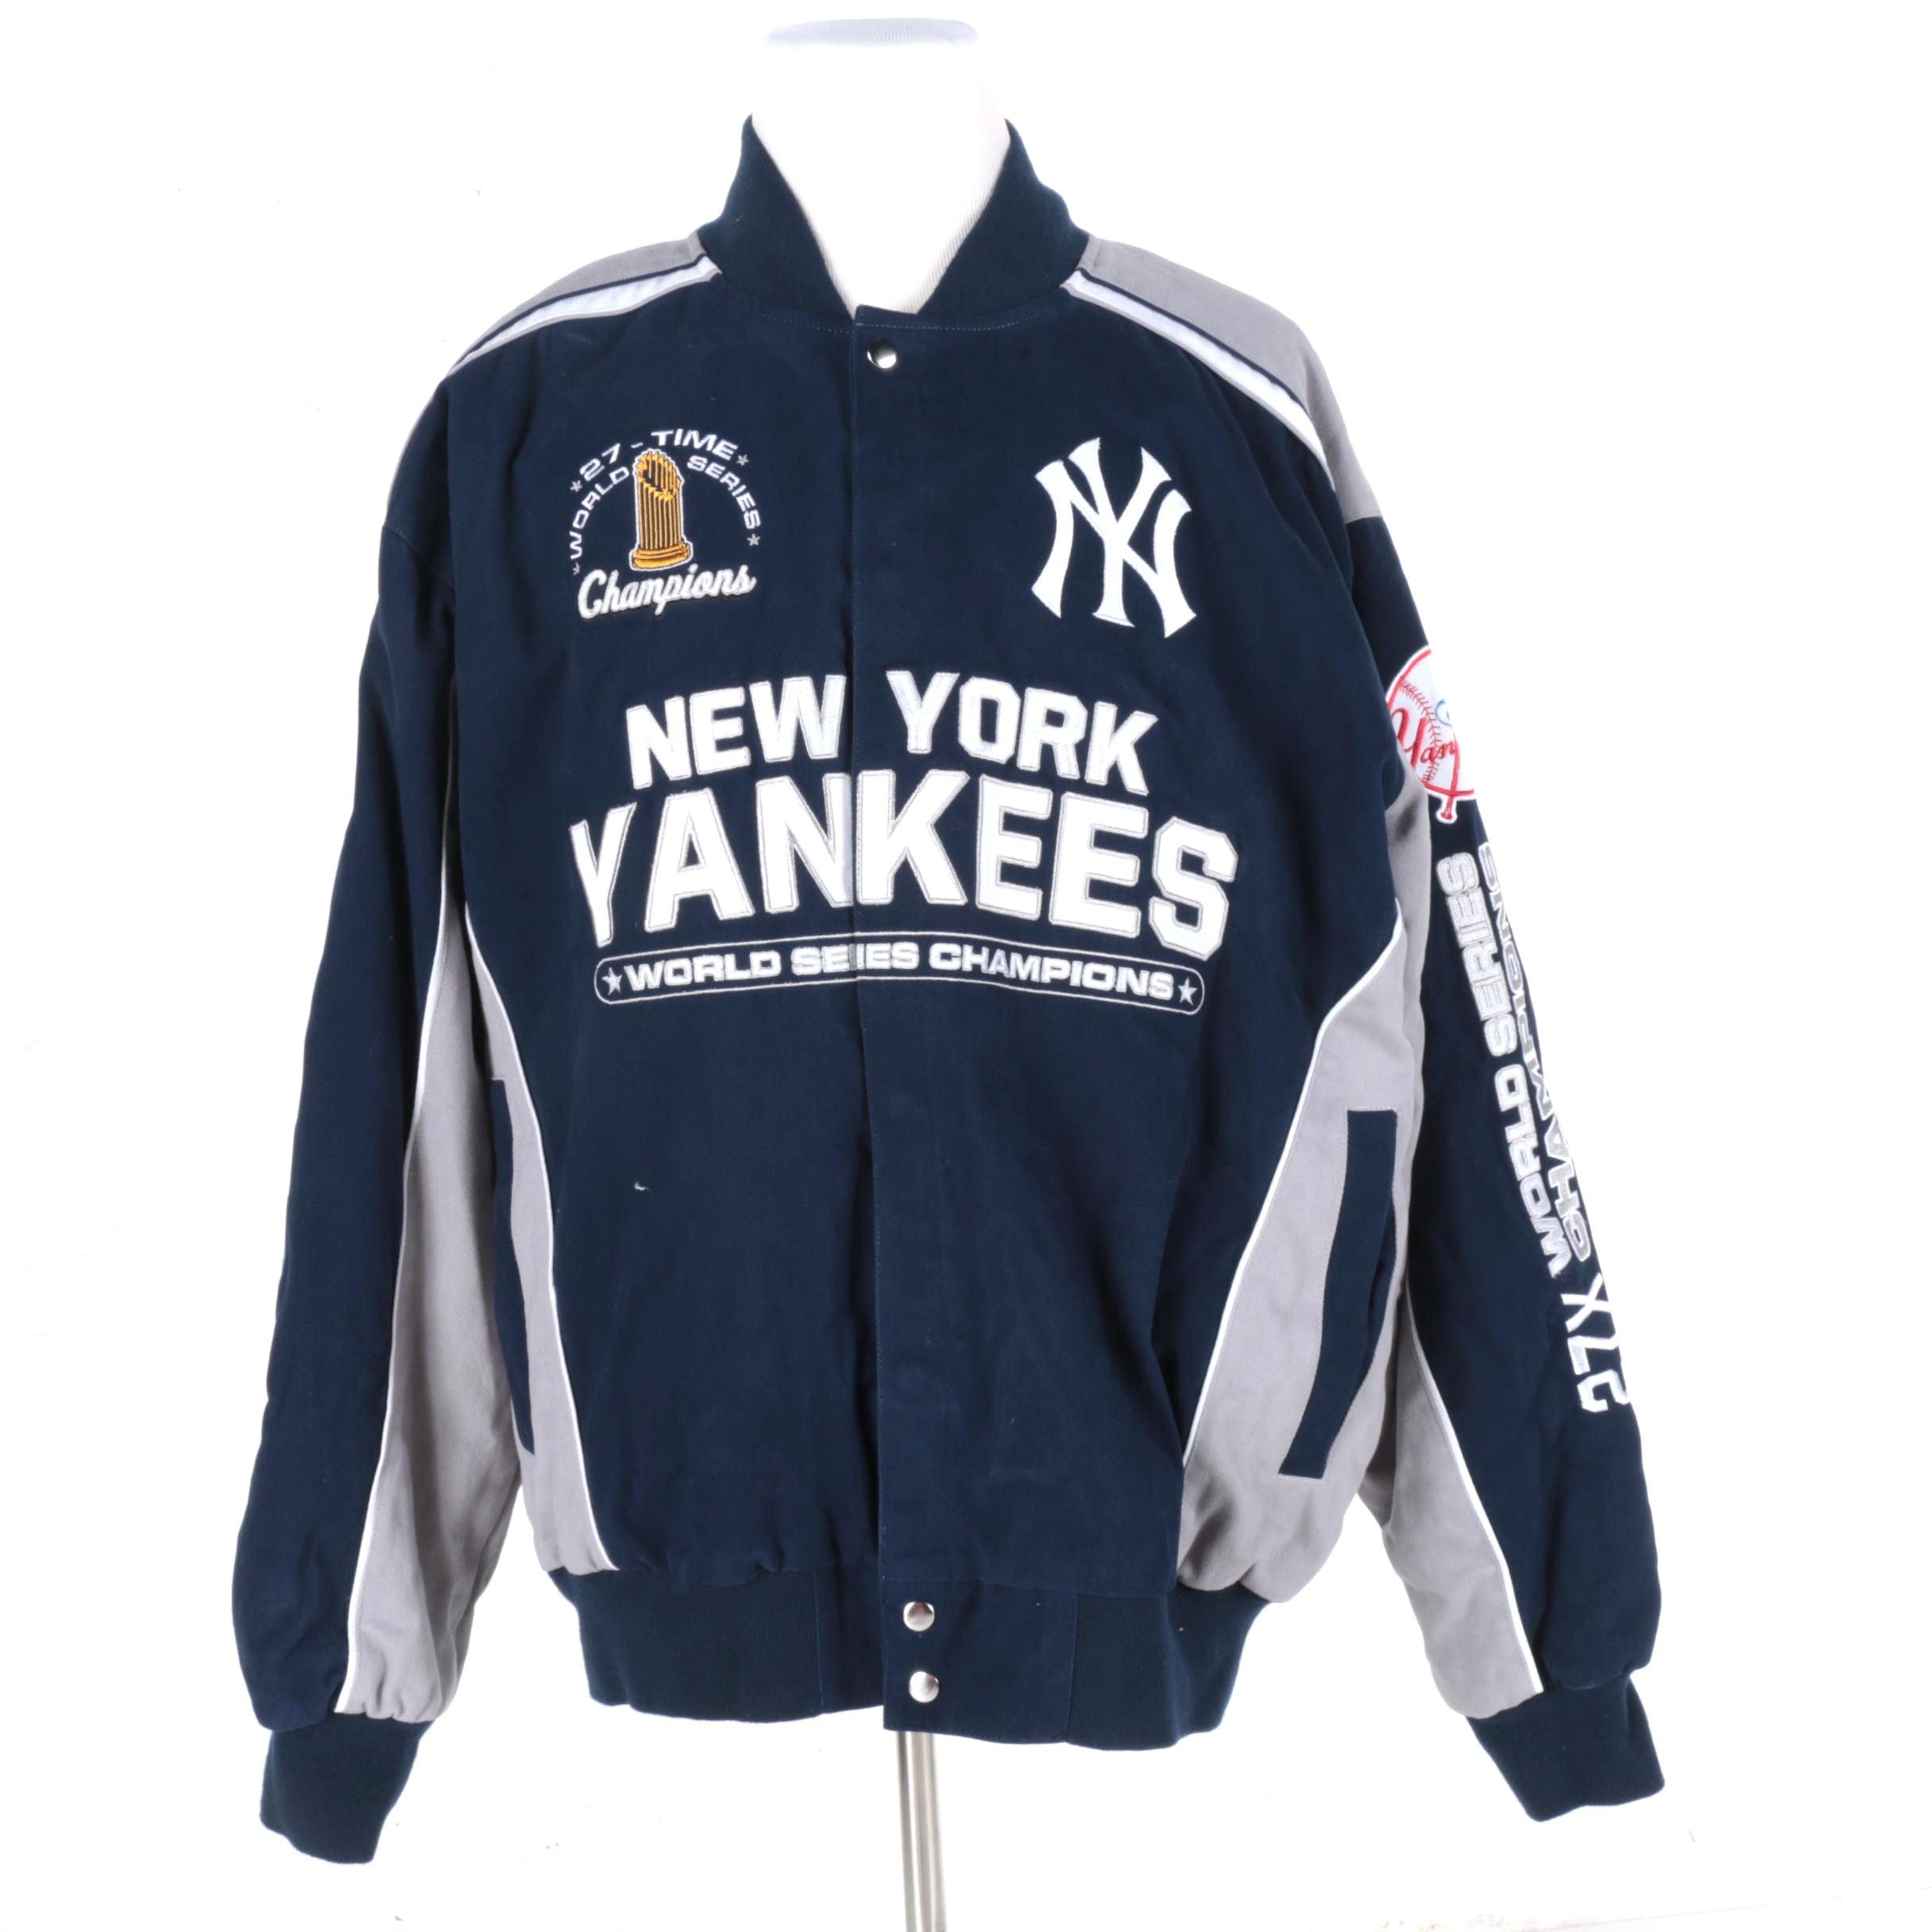 Priority New York Yankees World Series Champions Jacket Ebth